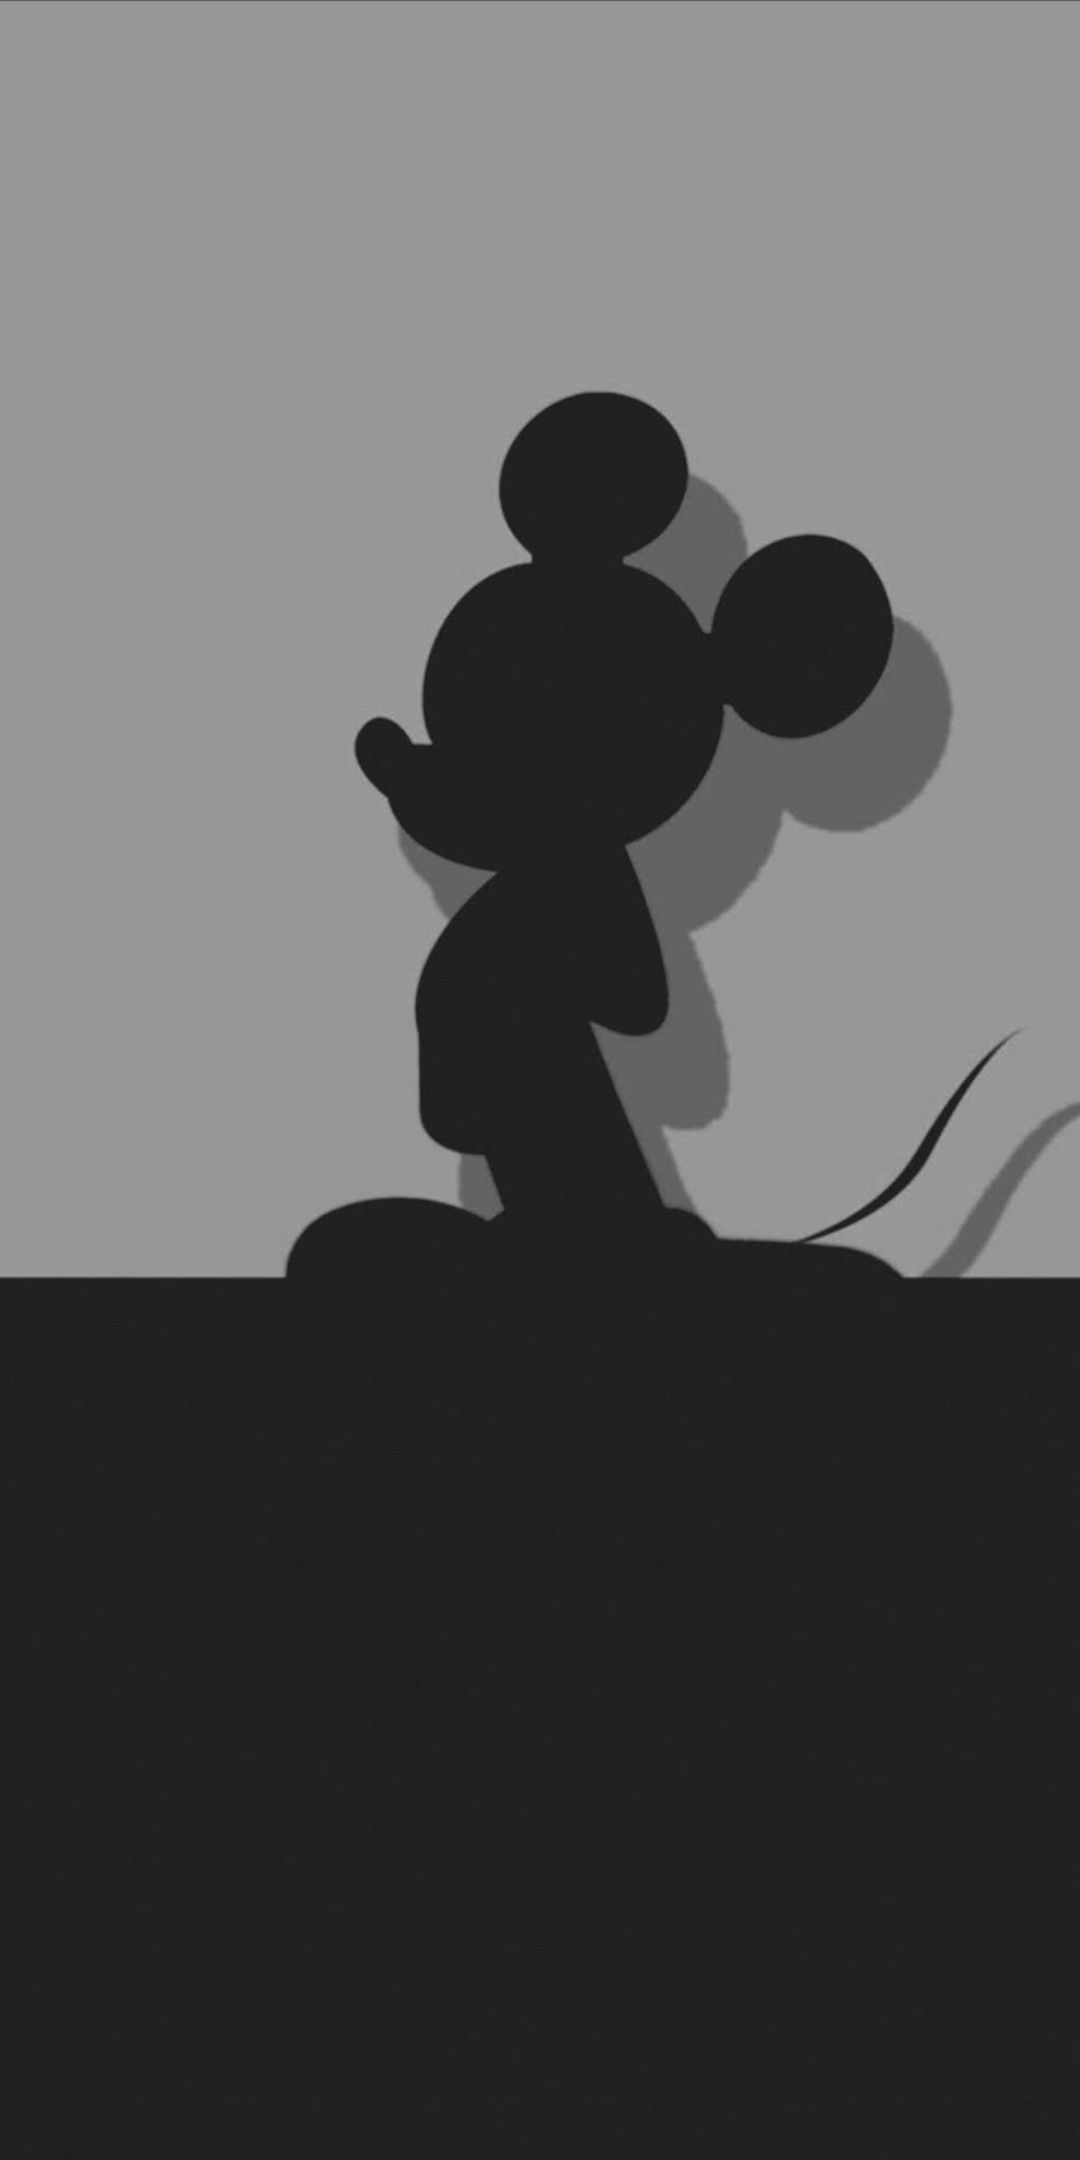 Mickey Mouse Fond D Ecran De Cellulaire Sur Le Theme De Disney 51 Clubboxingday Boxingday Boxi Rabais Circulair Lukisan Disney Wallpaper Iphone Kartu